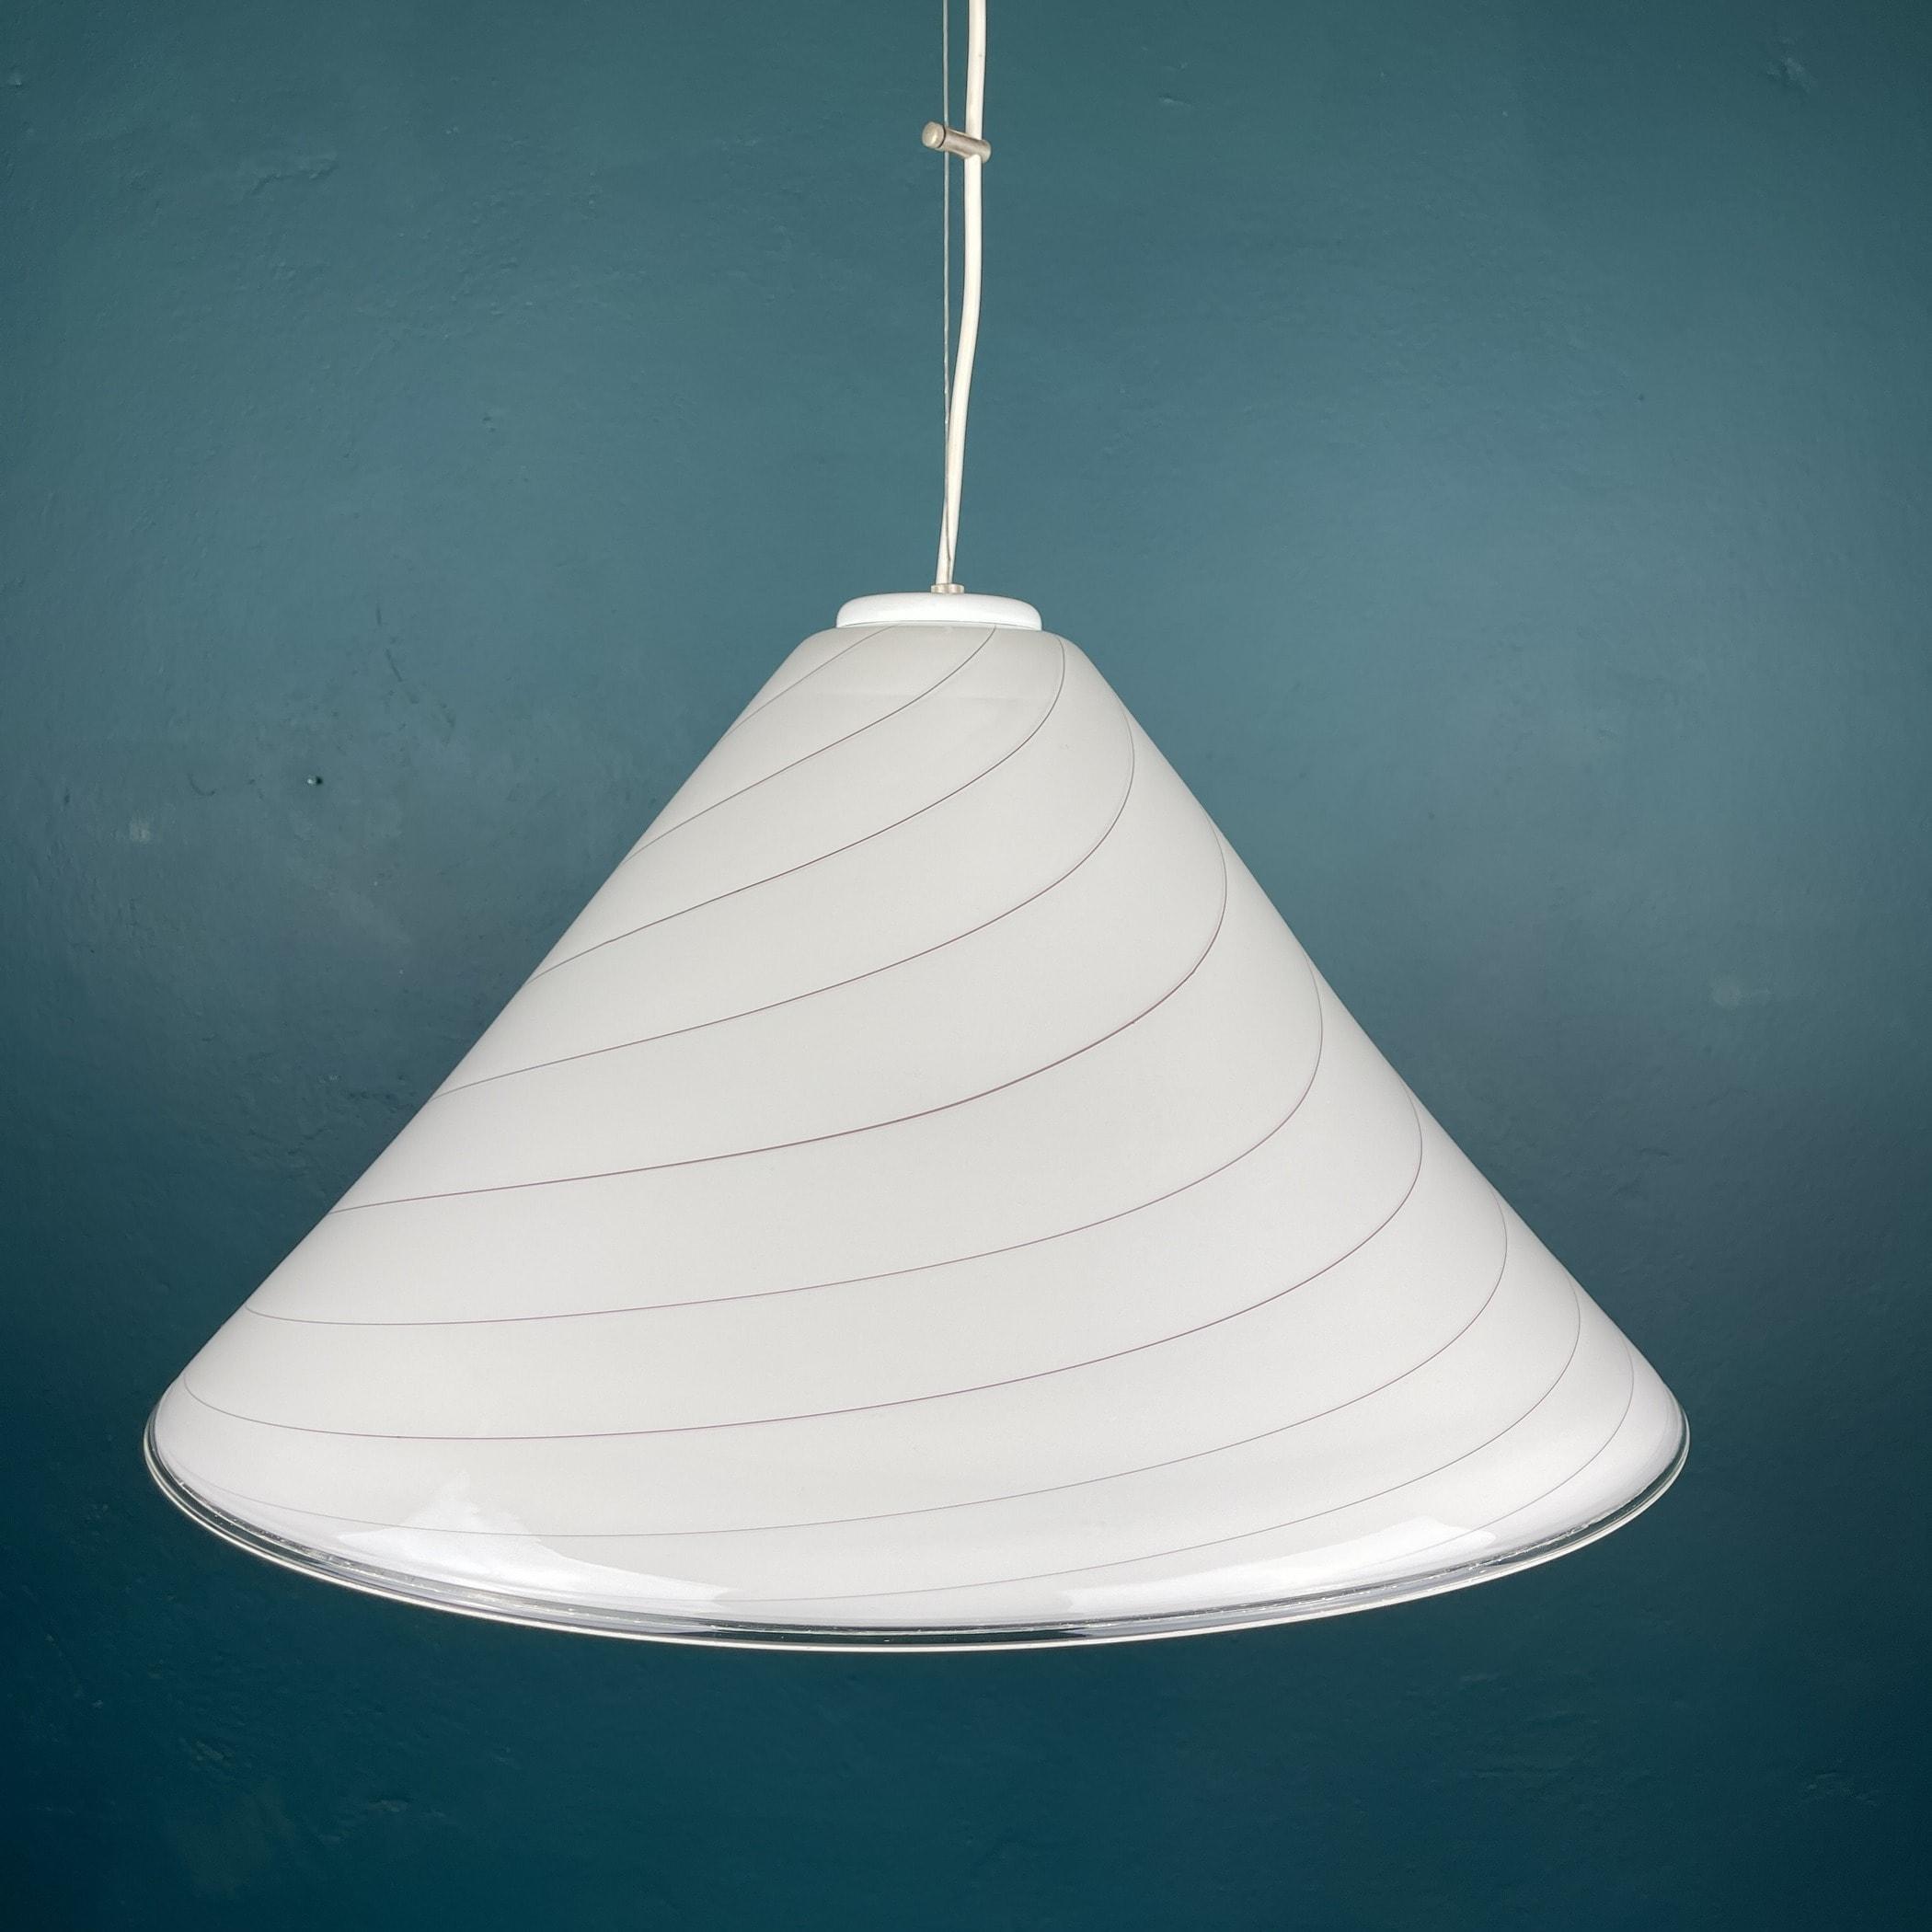 Vintage swirl murano white pendant lamp Italy 1970s Mid-century italian light